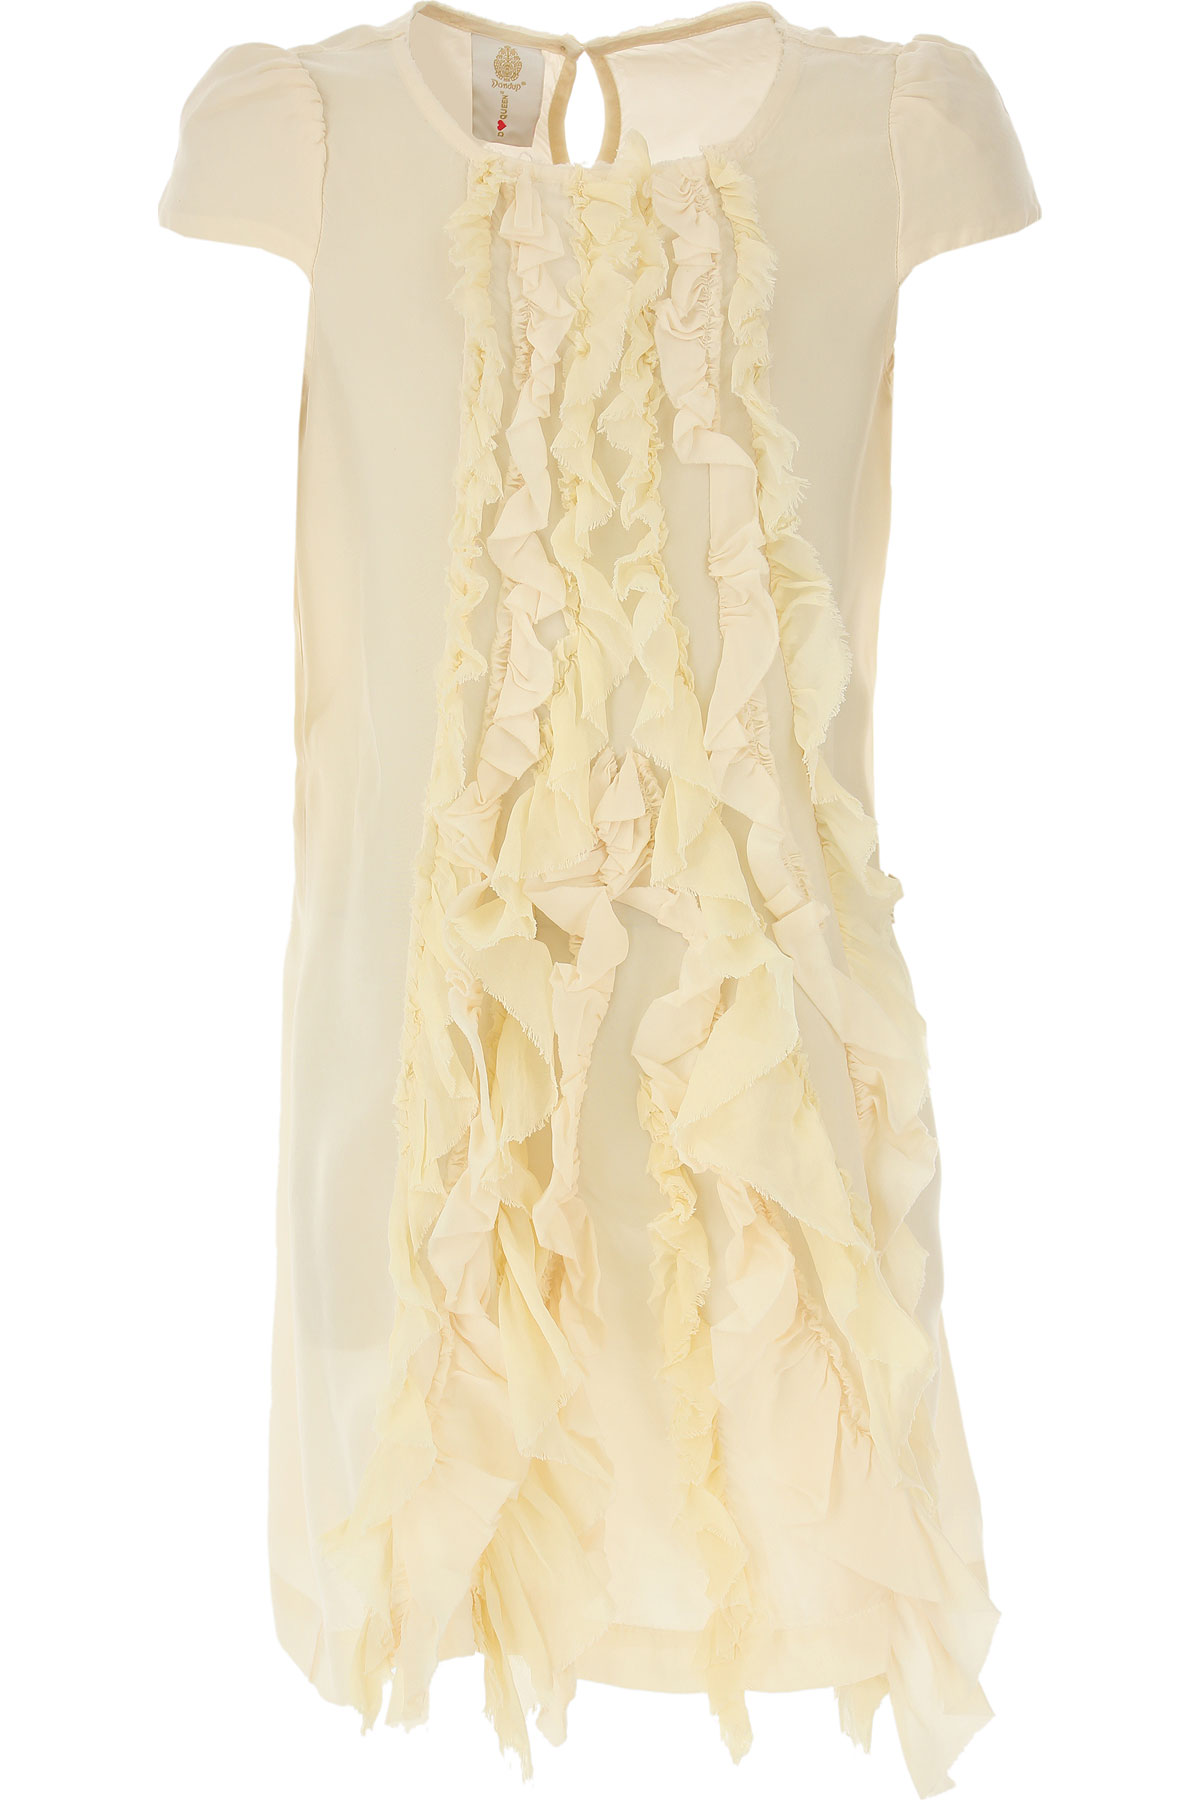 Dondup Girls Dress On Sale in Outlet, Beige, cupro, 2019, 10Y 4Y